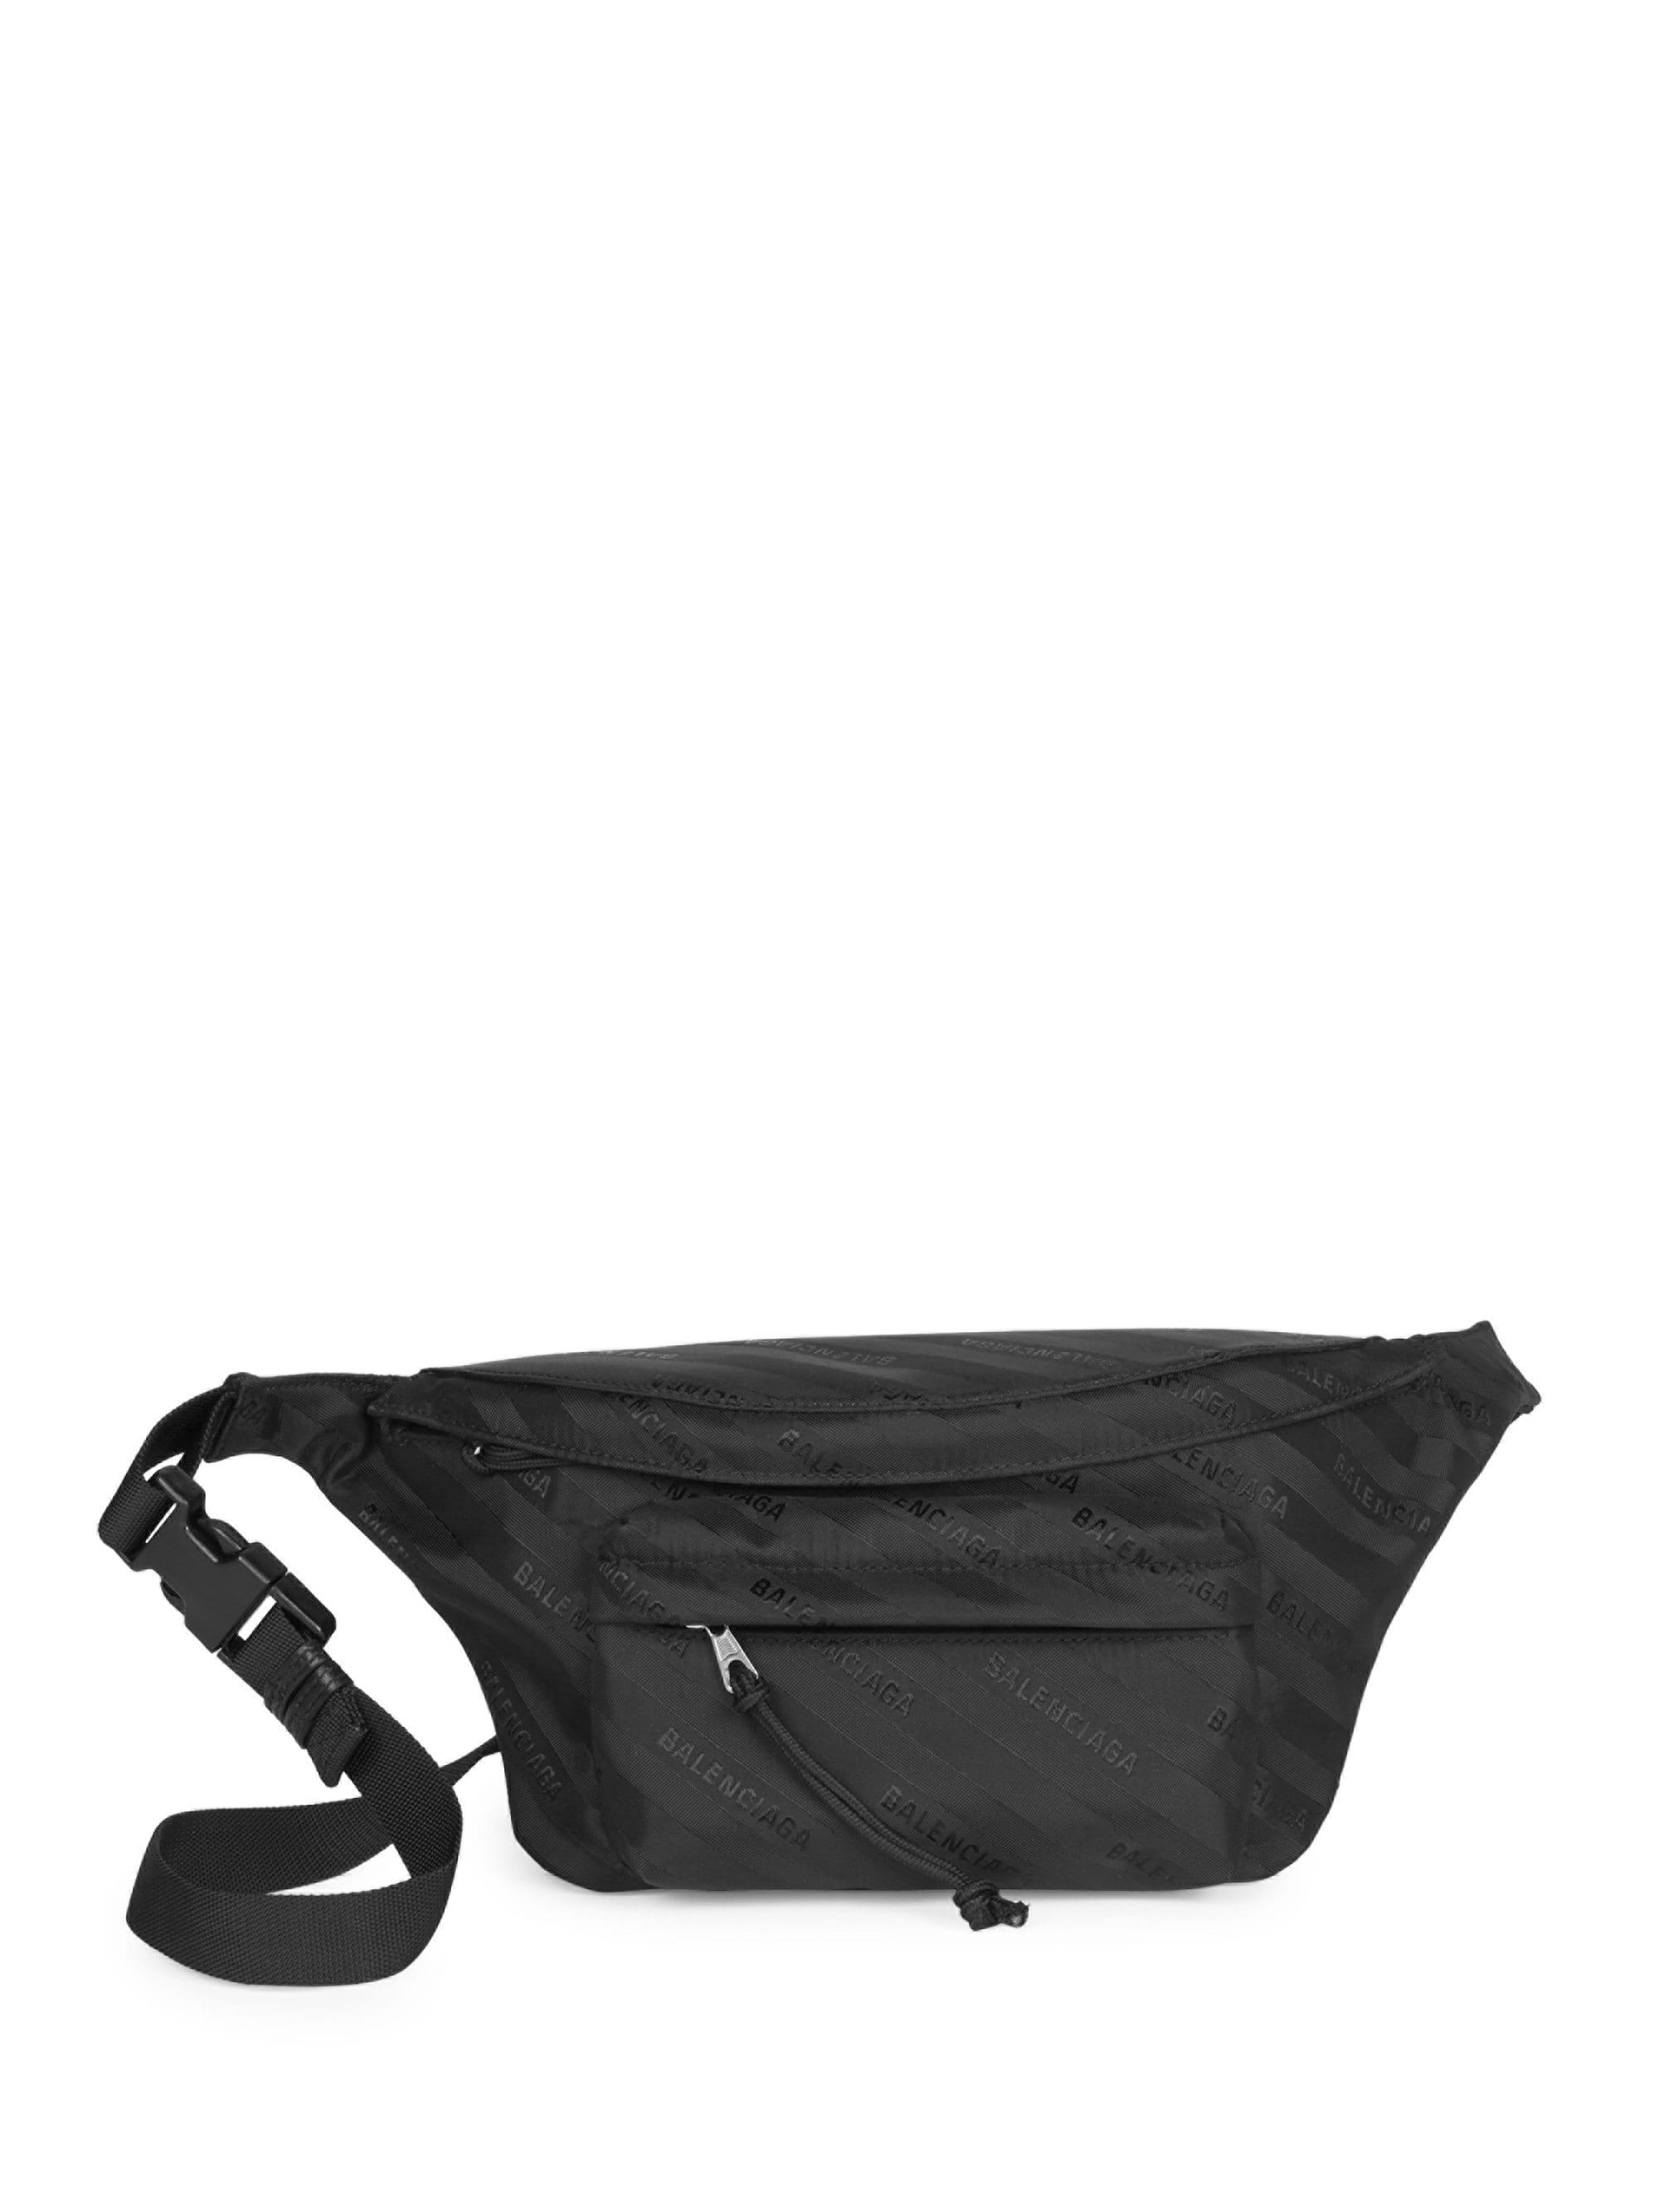 5175c862c4 Balenciaga - Black Women s Wheel Nylon Logo Belt Bag - Noir - Lyst. View  fullscreen